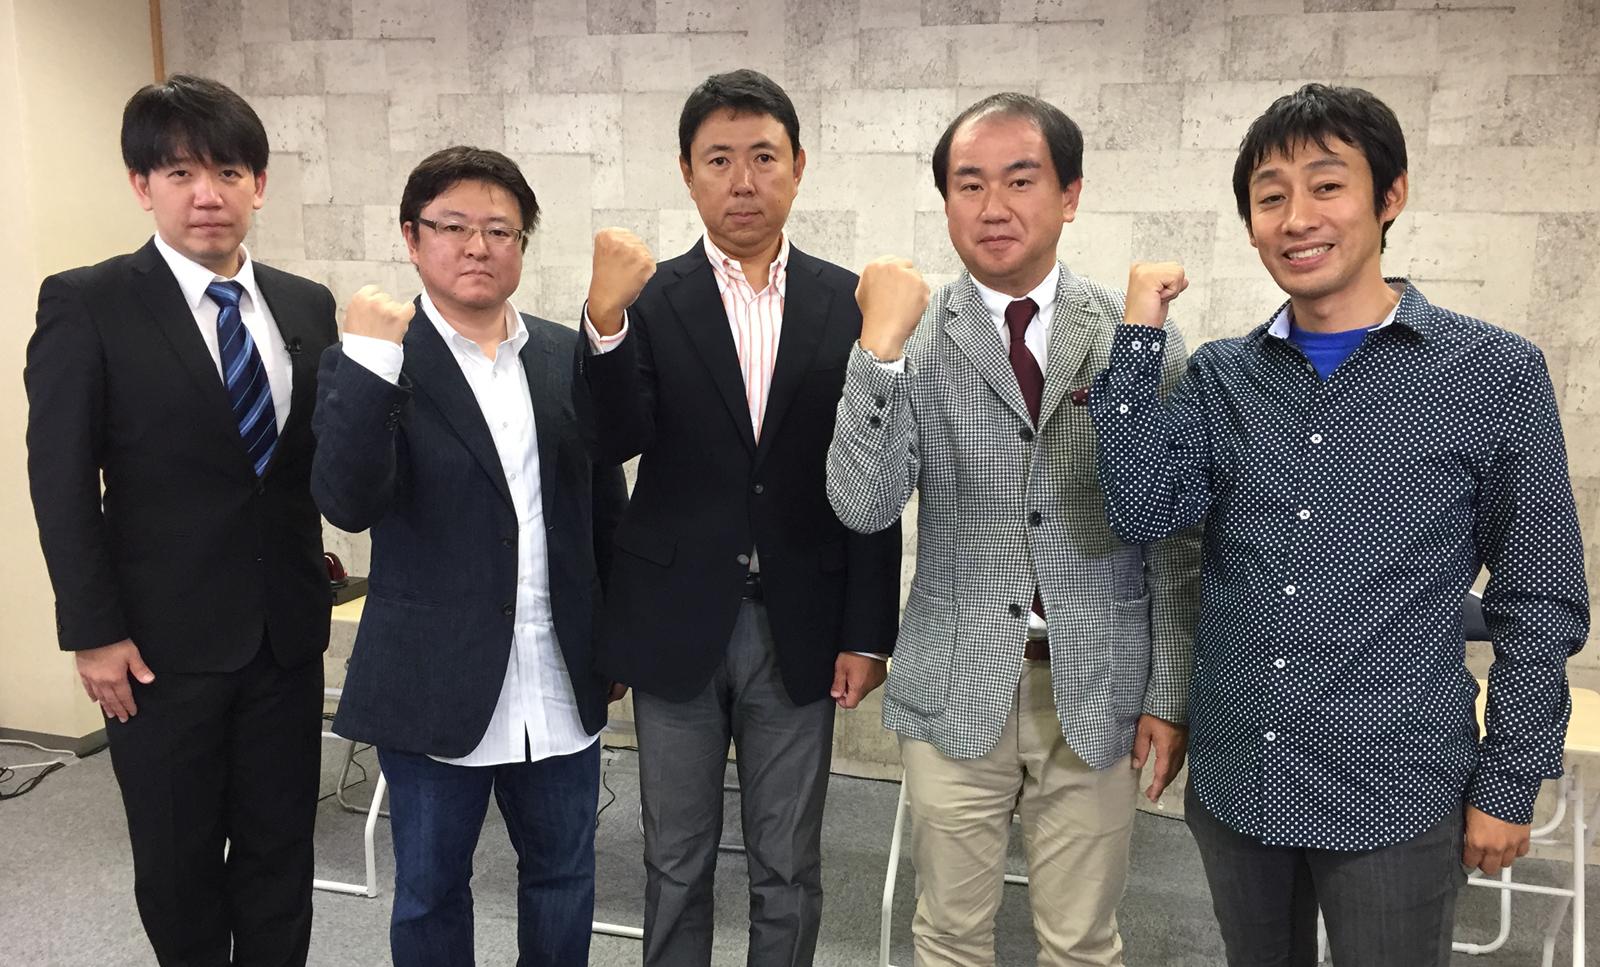 QUIZ JAPAN TVのオリジナルクイズ番組「魁!!クイズ塾」第32回は「第2回パネルクイズアタック25年間チャンピオン大会」!